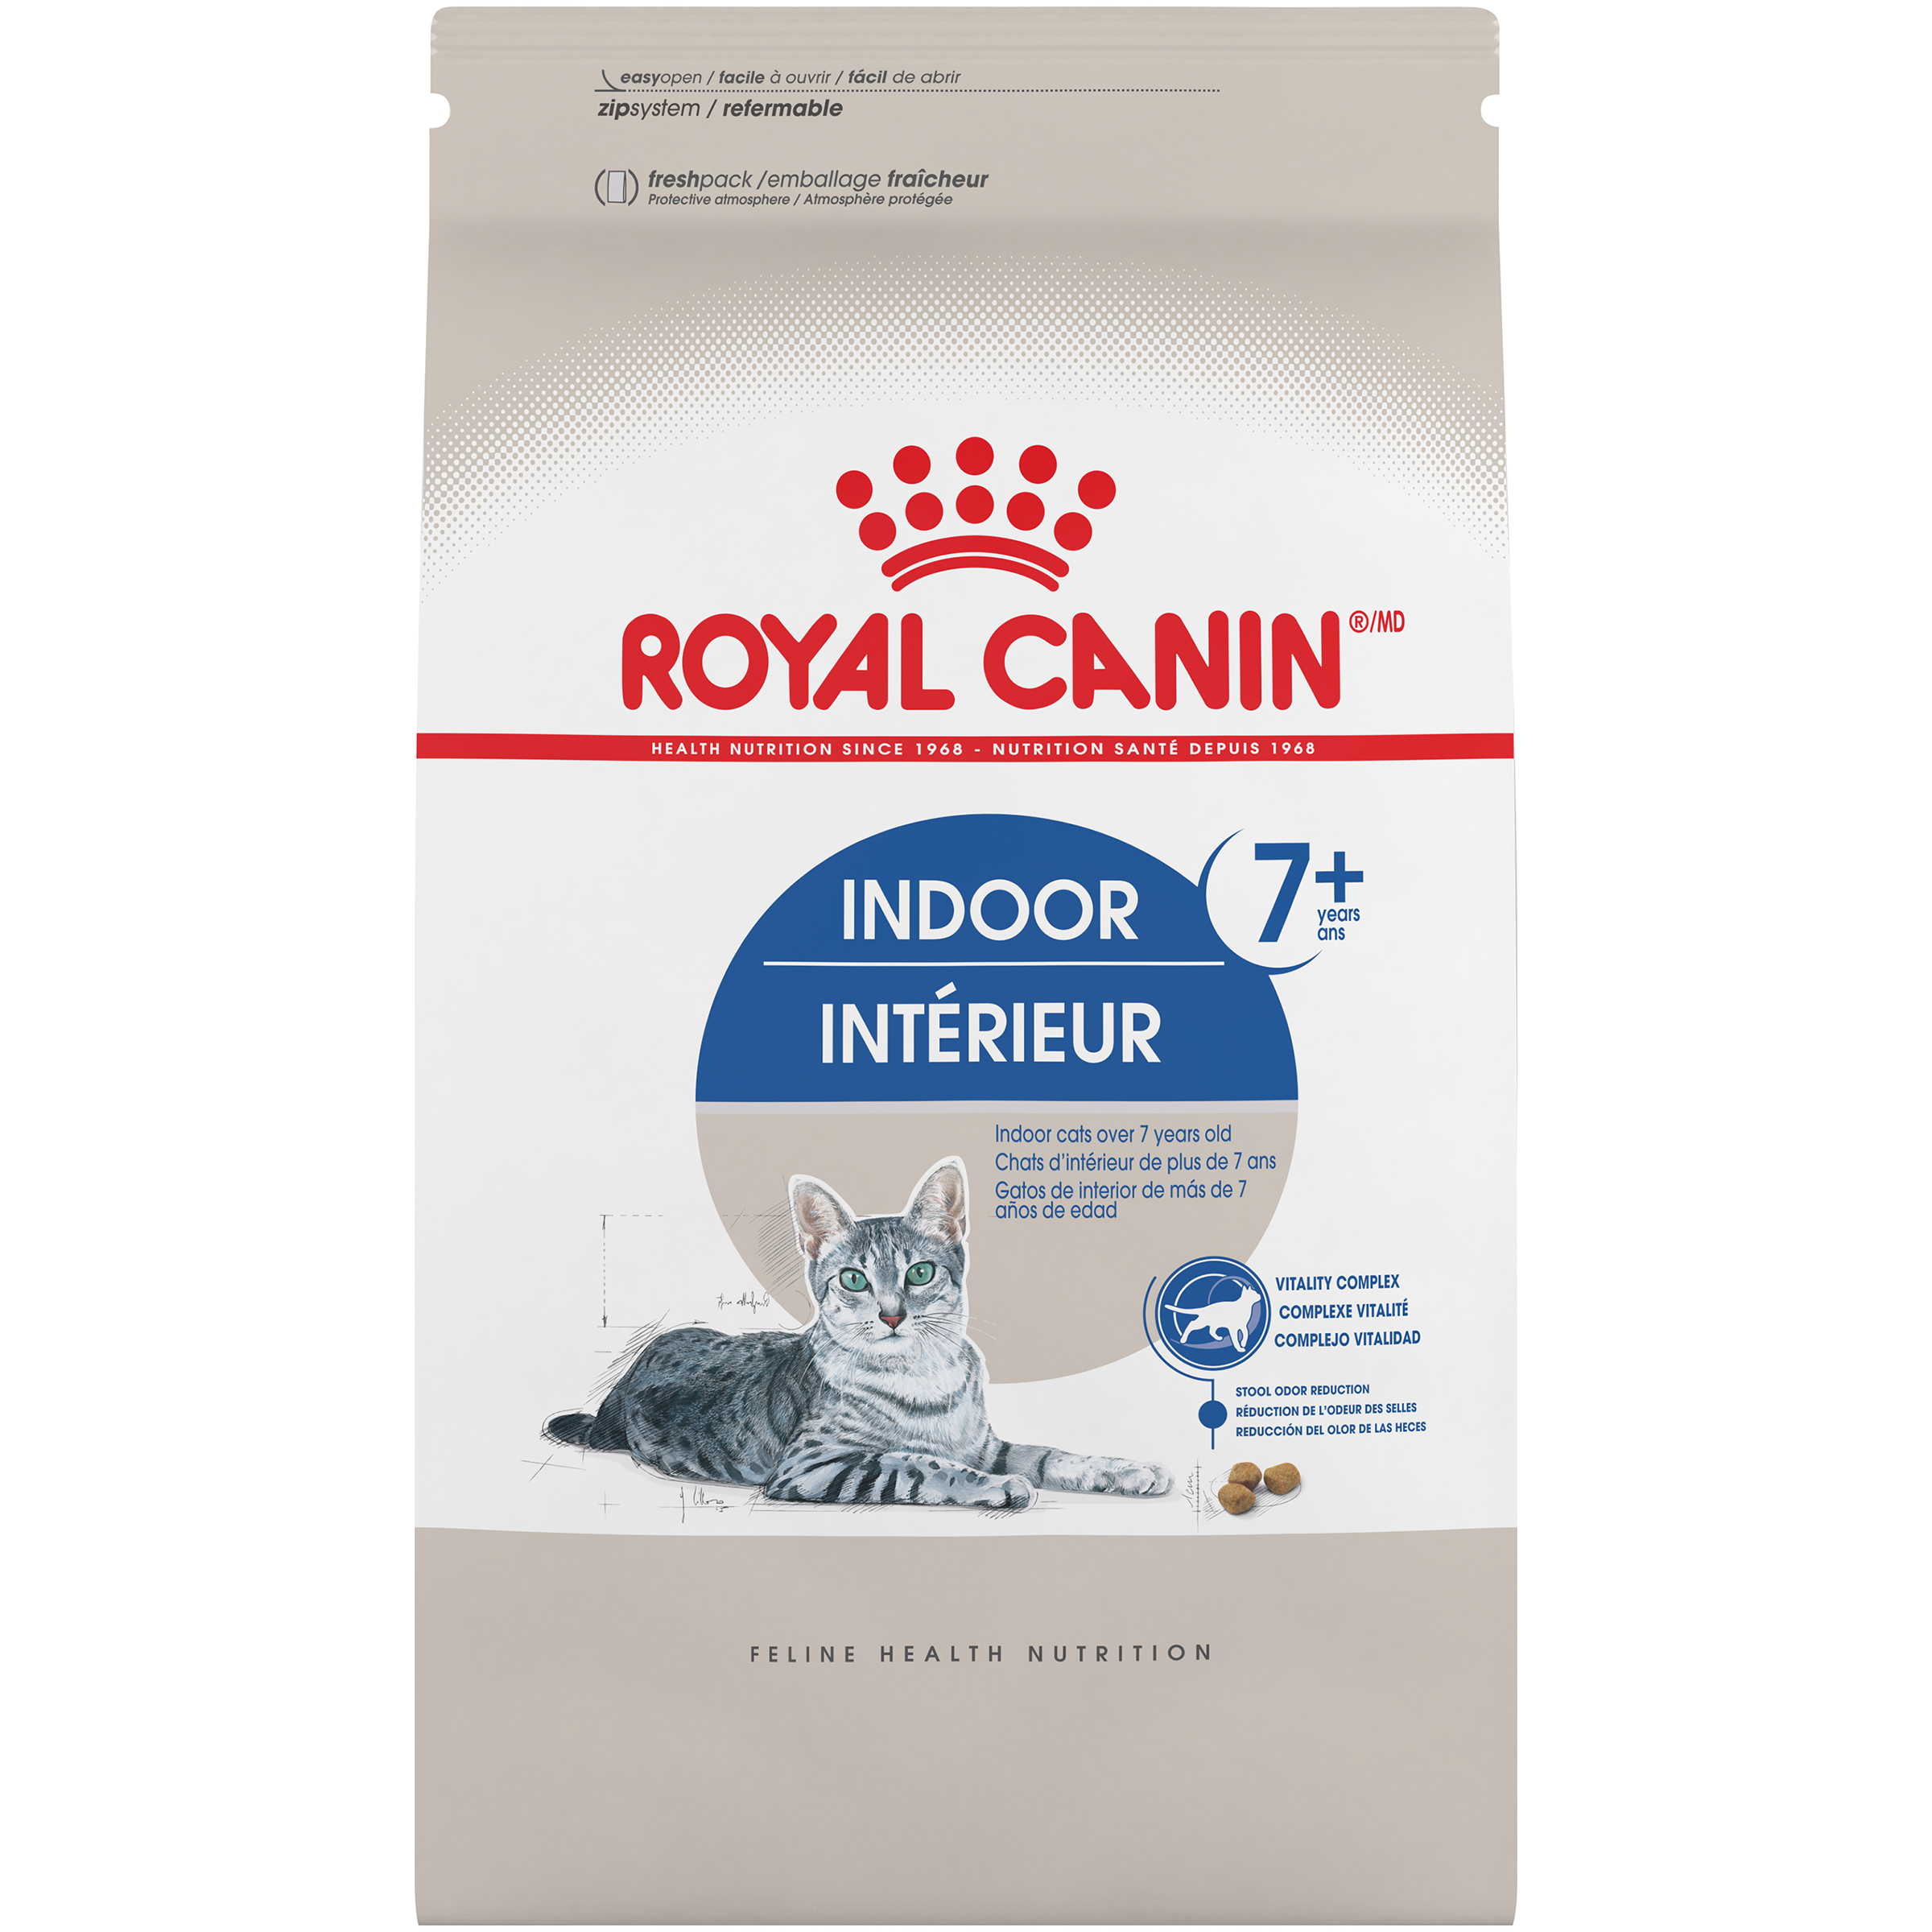 Royal Canin Indoor Mature 27 Senior Dry Cat Food, 2.5 lb